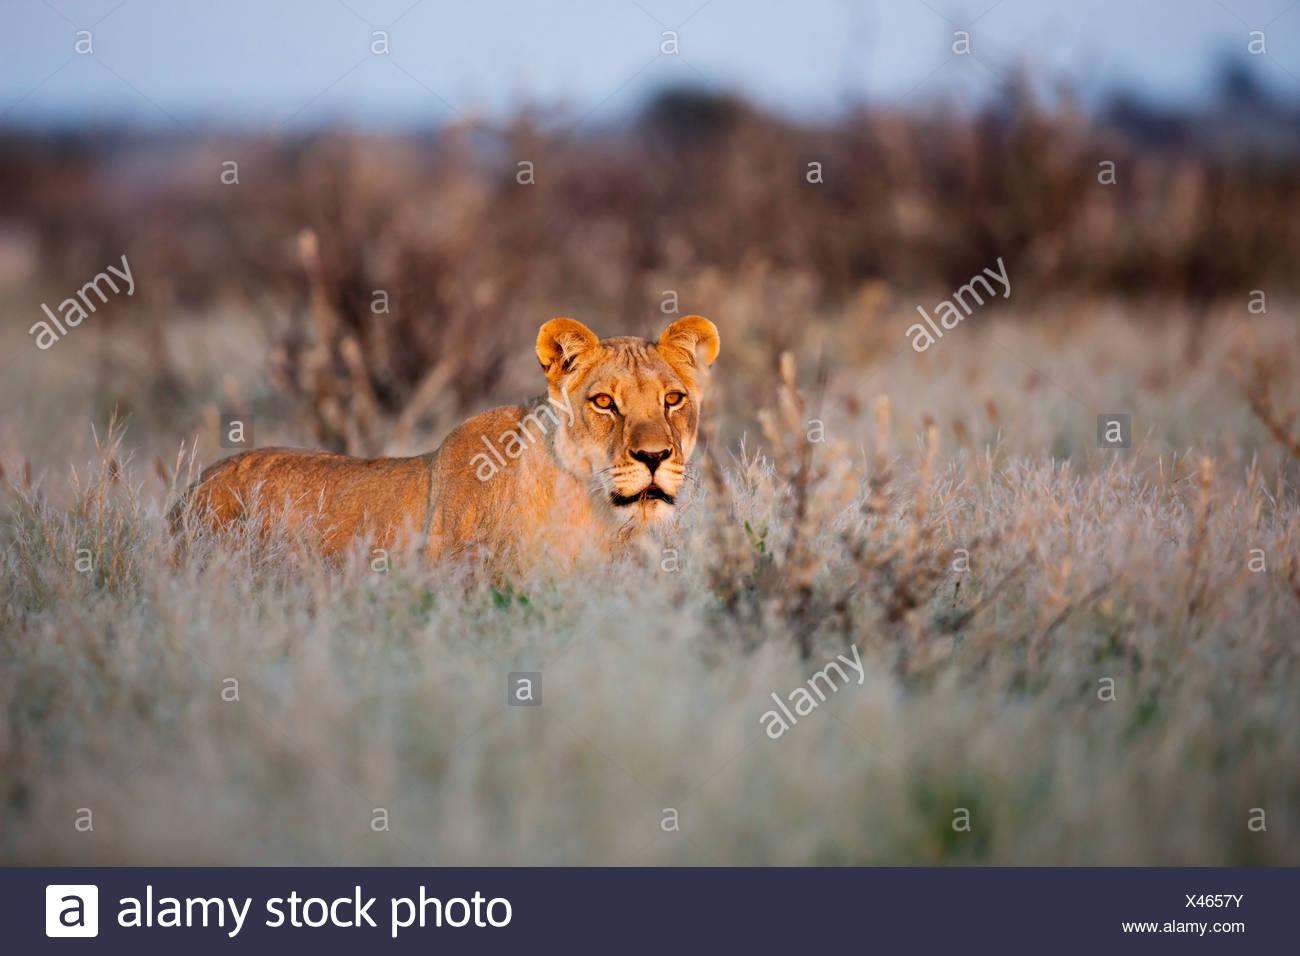 Africa, Botswana, Lioness in central kalahari game reserve - Stock Image